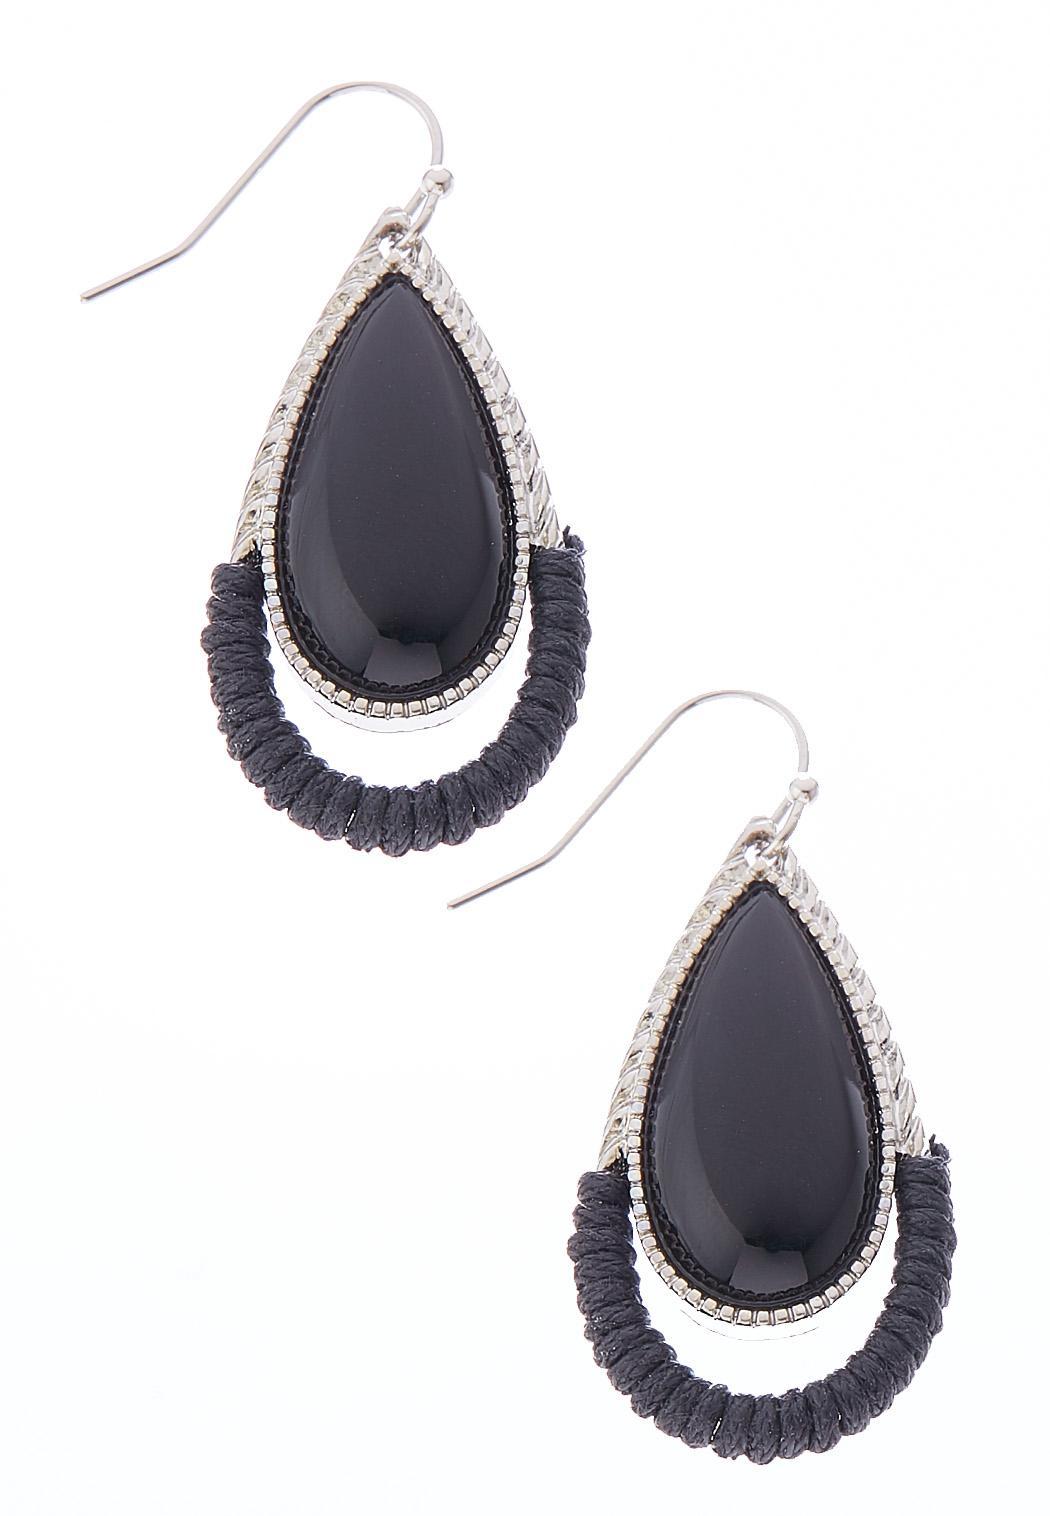 Acrylic Thread Wrapped Earrings